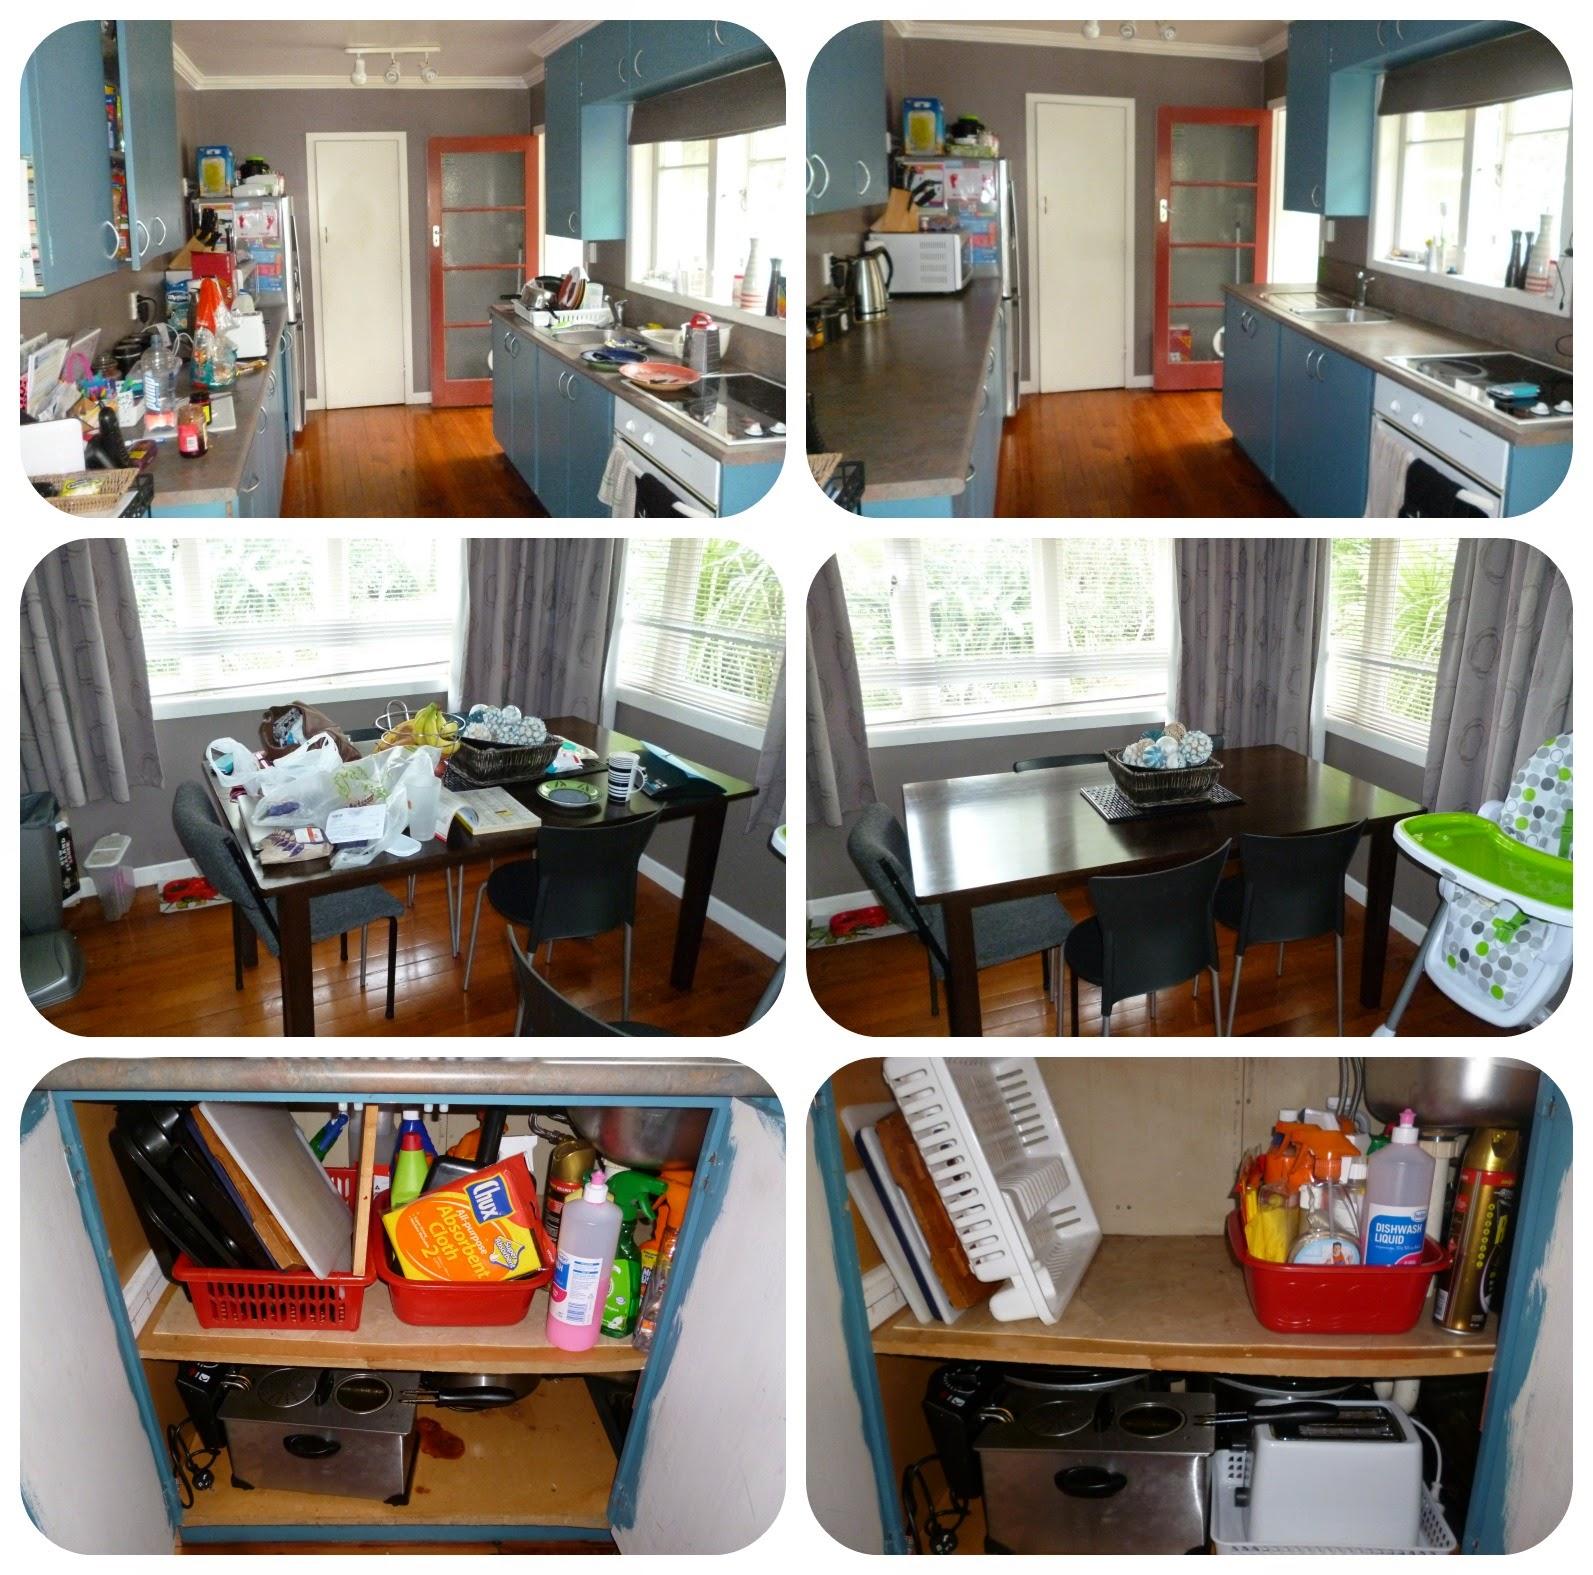 http://teacherbytrade-motherbynature.blogspot.co.nz/2014/10/20-day-challenge-day-1-kitchen.html